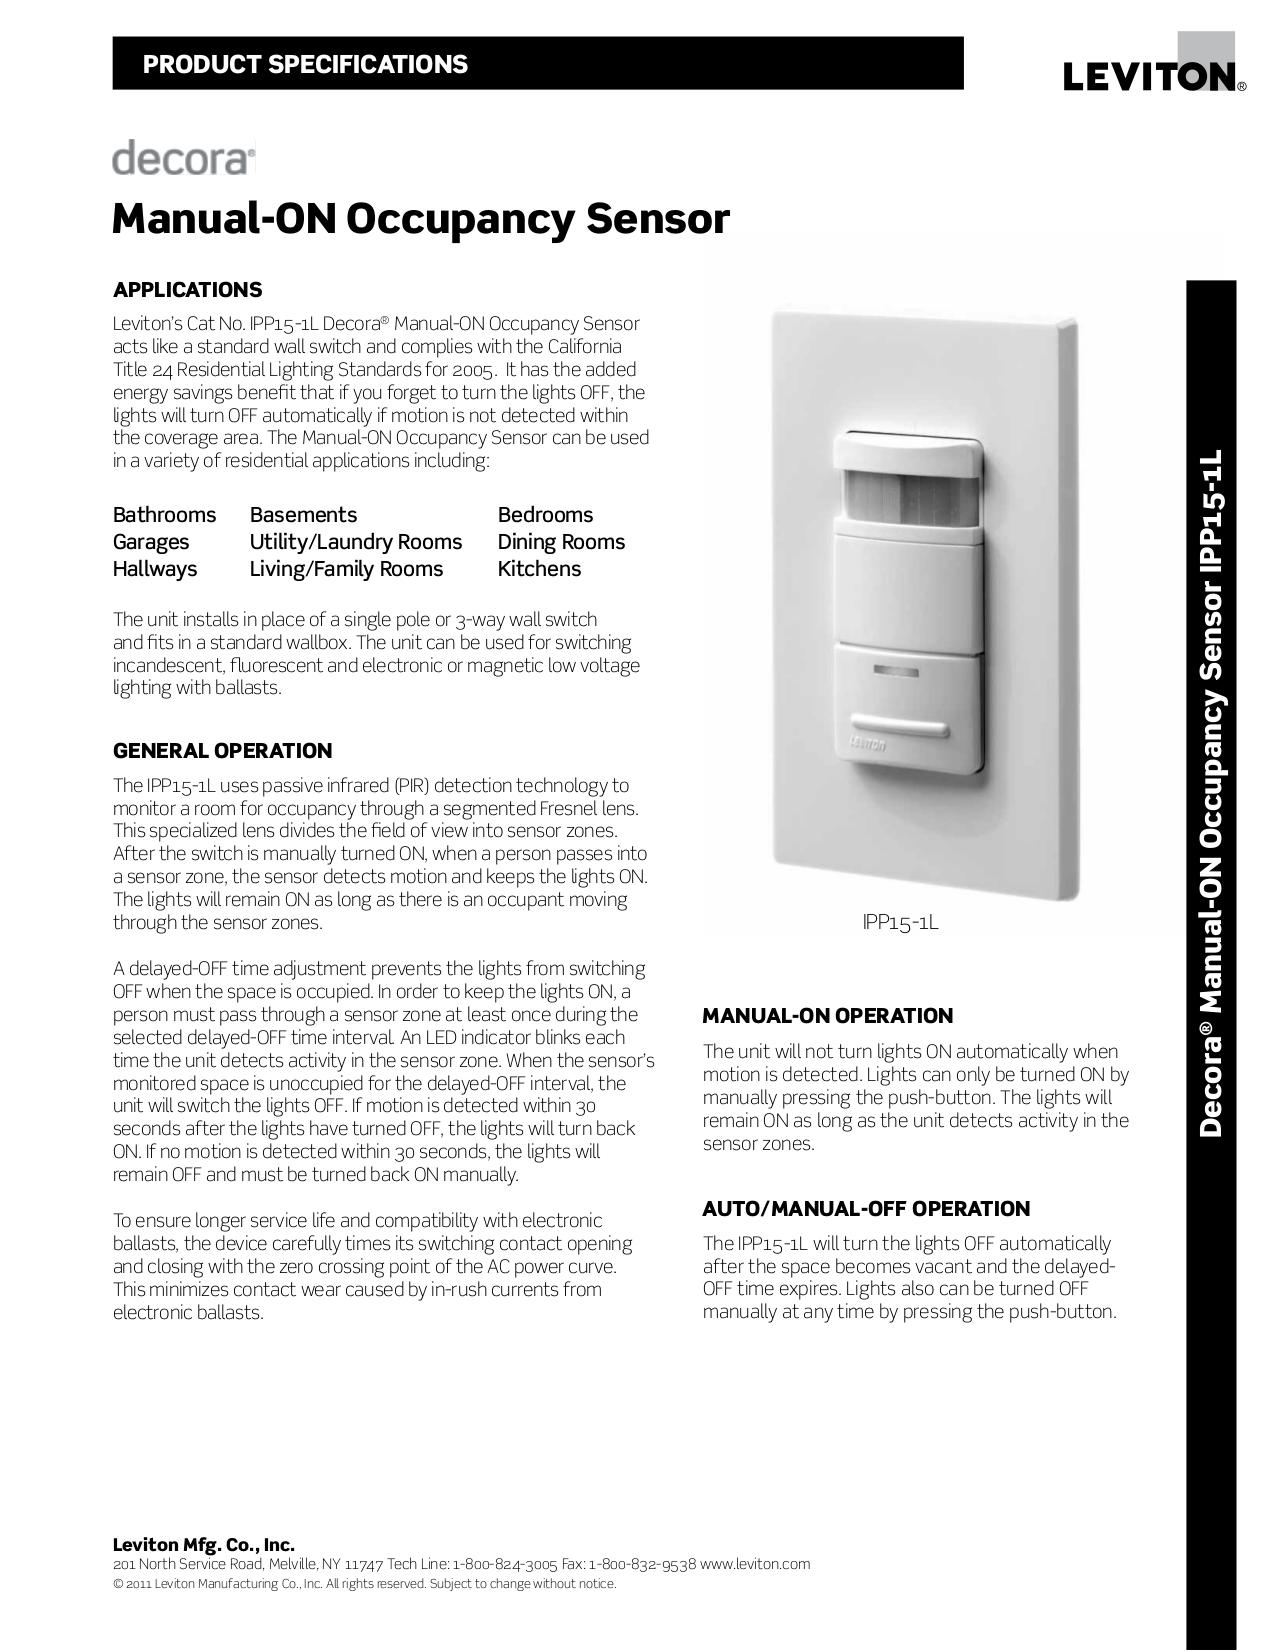 Download free pdf for Leviton IPP15-1L Occupancy Sensor Other manual